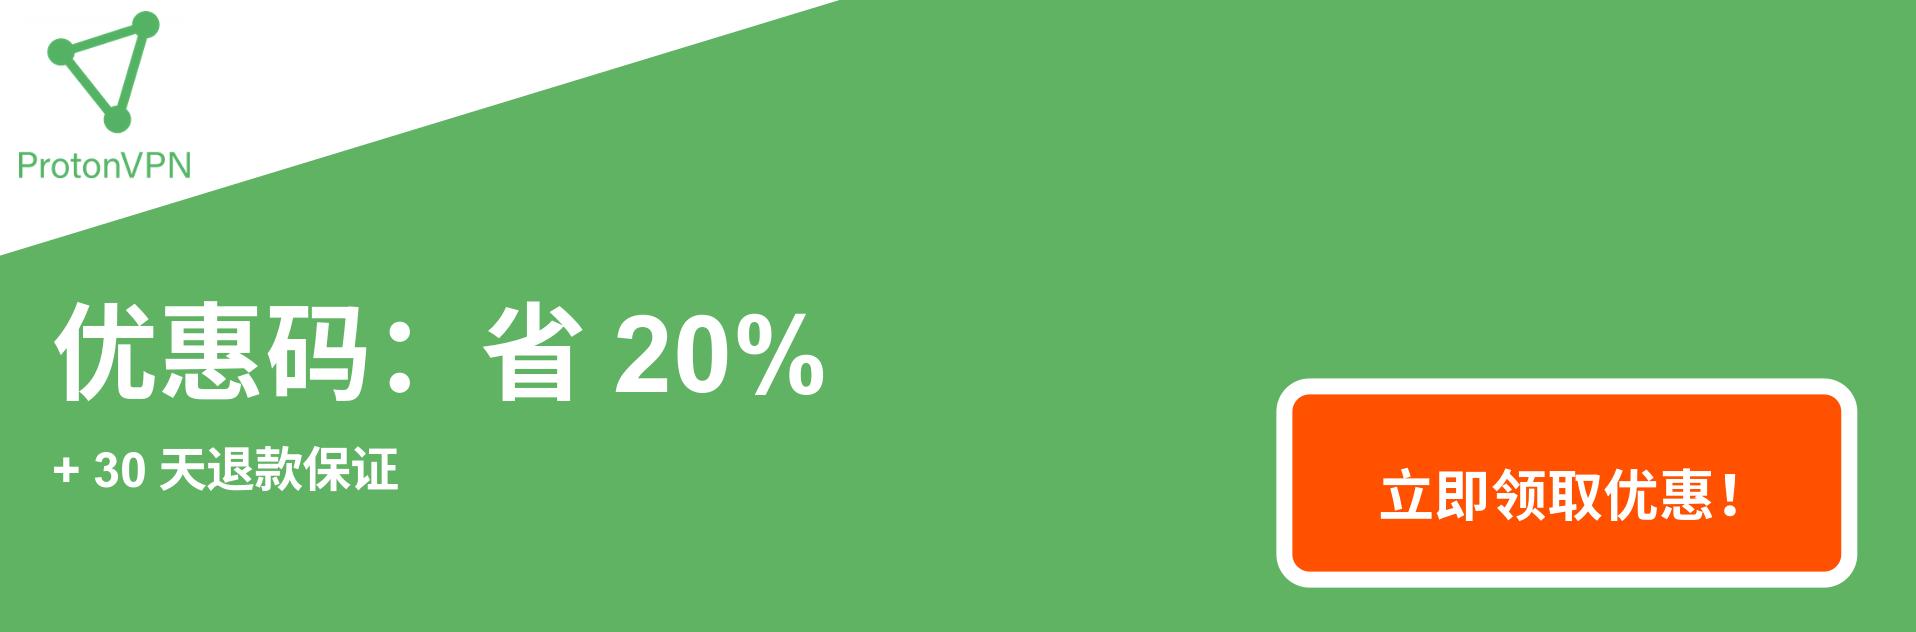 proton vpn coupon banner 20% off